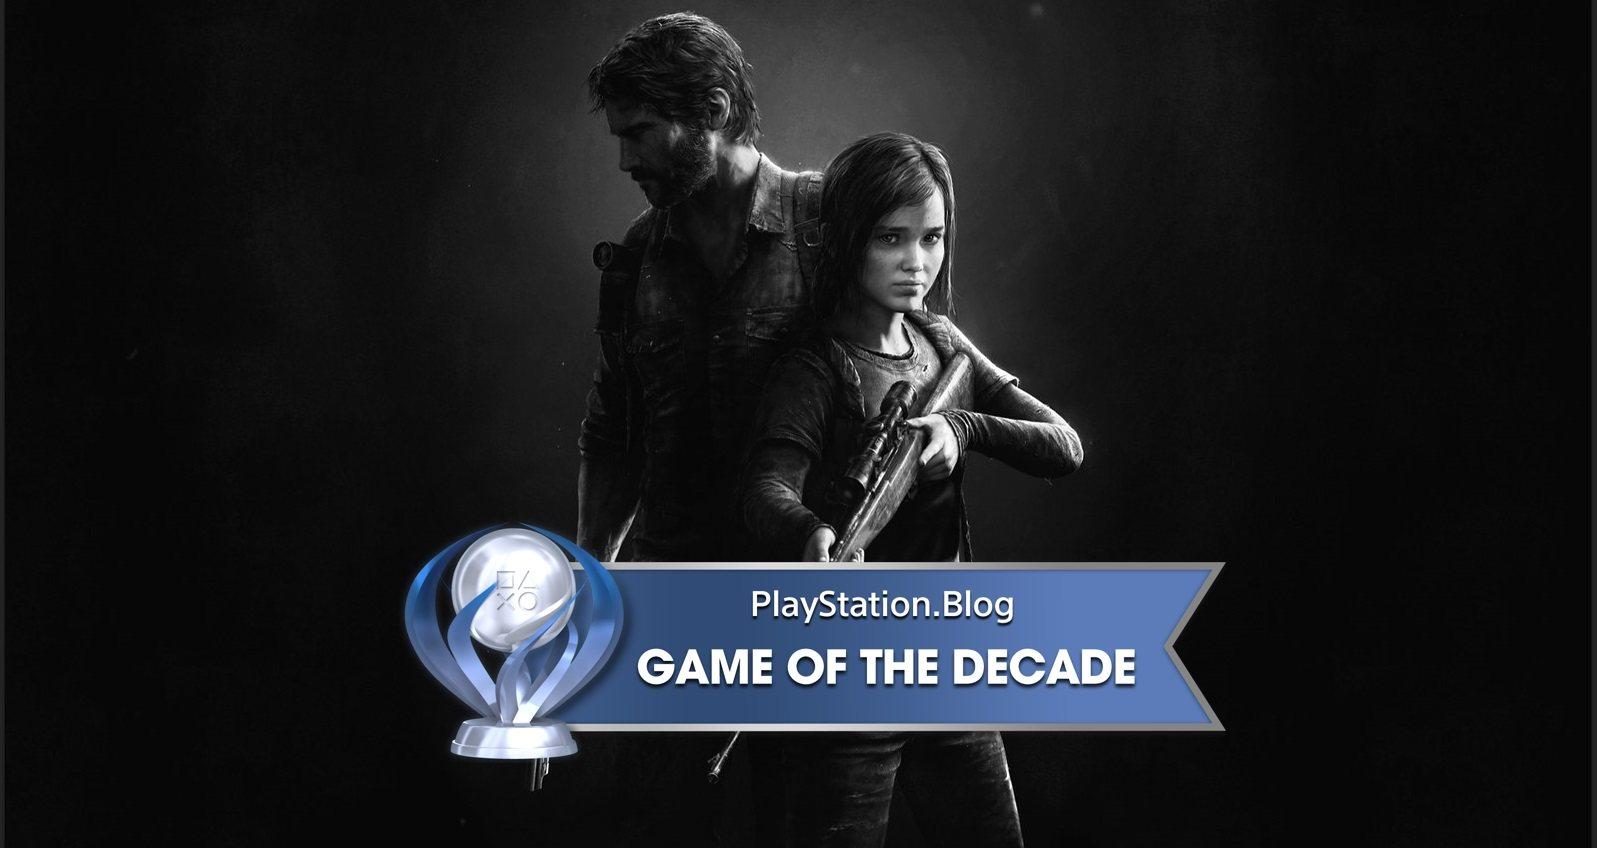 PlayStation社群选出十年最佳游戏:《最后生还者》荣获白金奖杯